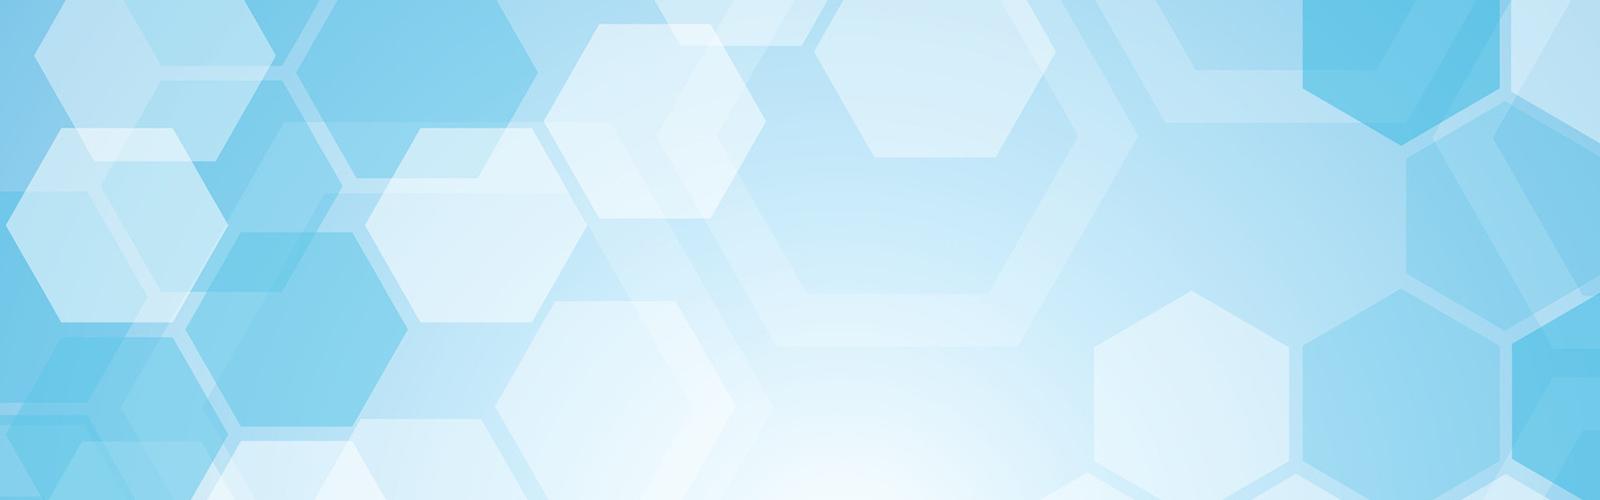 TransSouth Health Care Slider Background 1